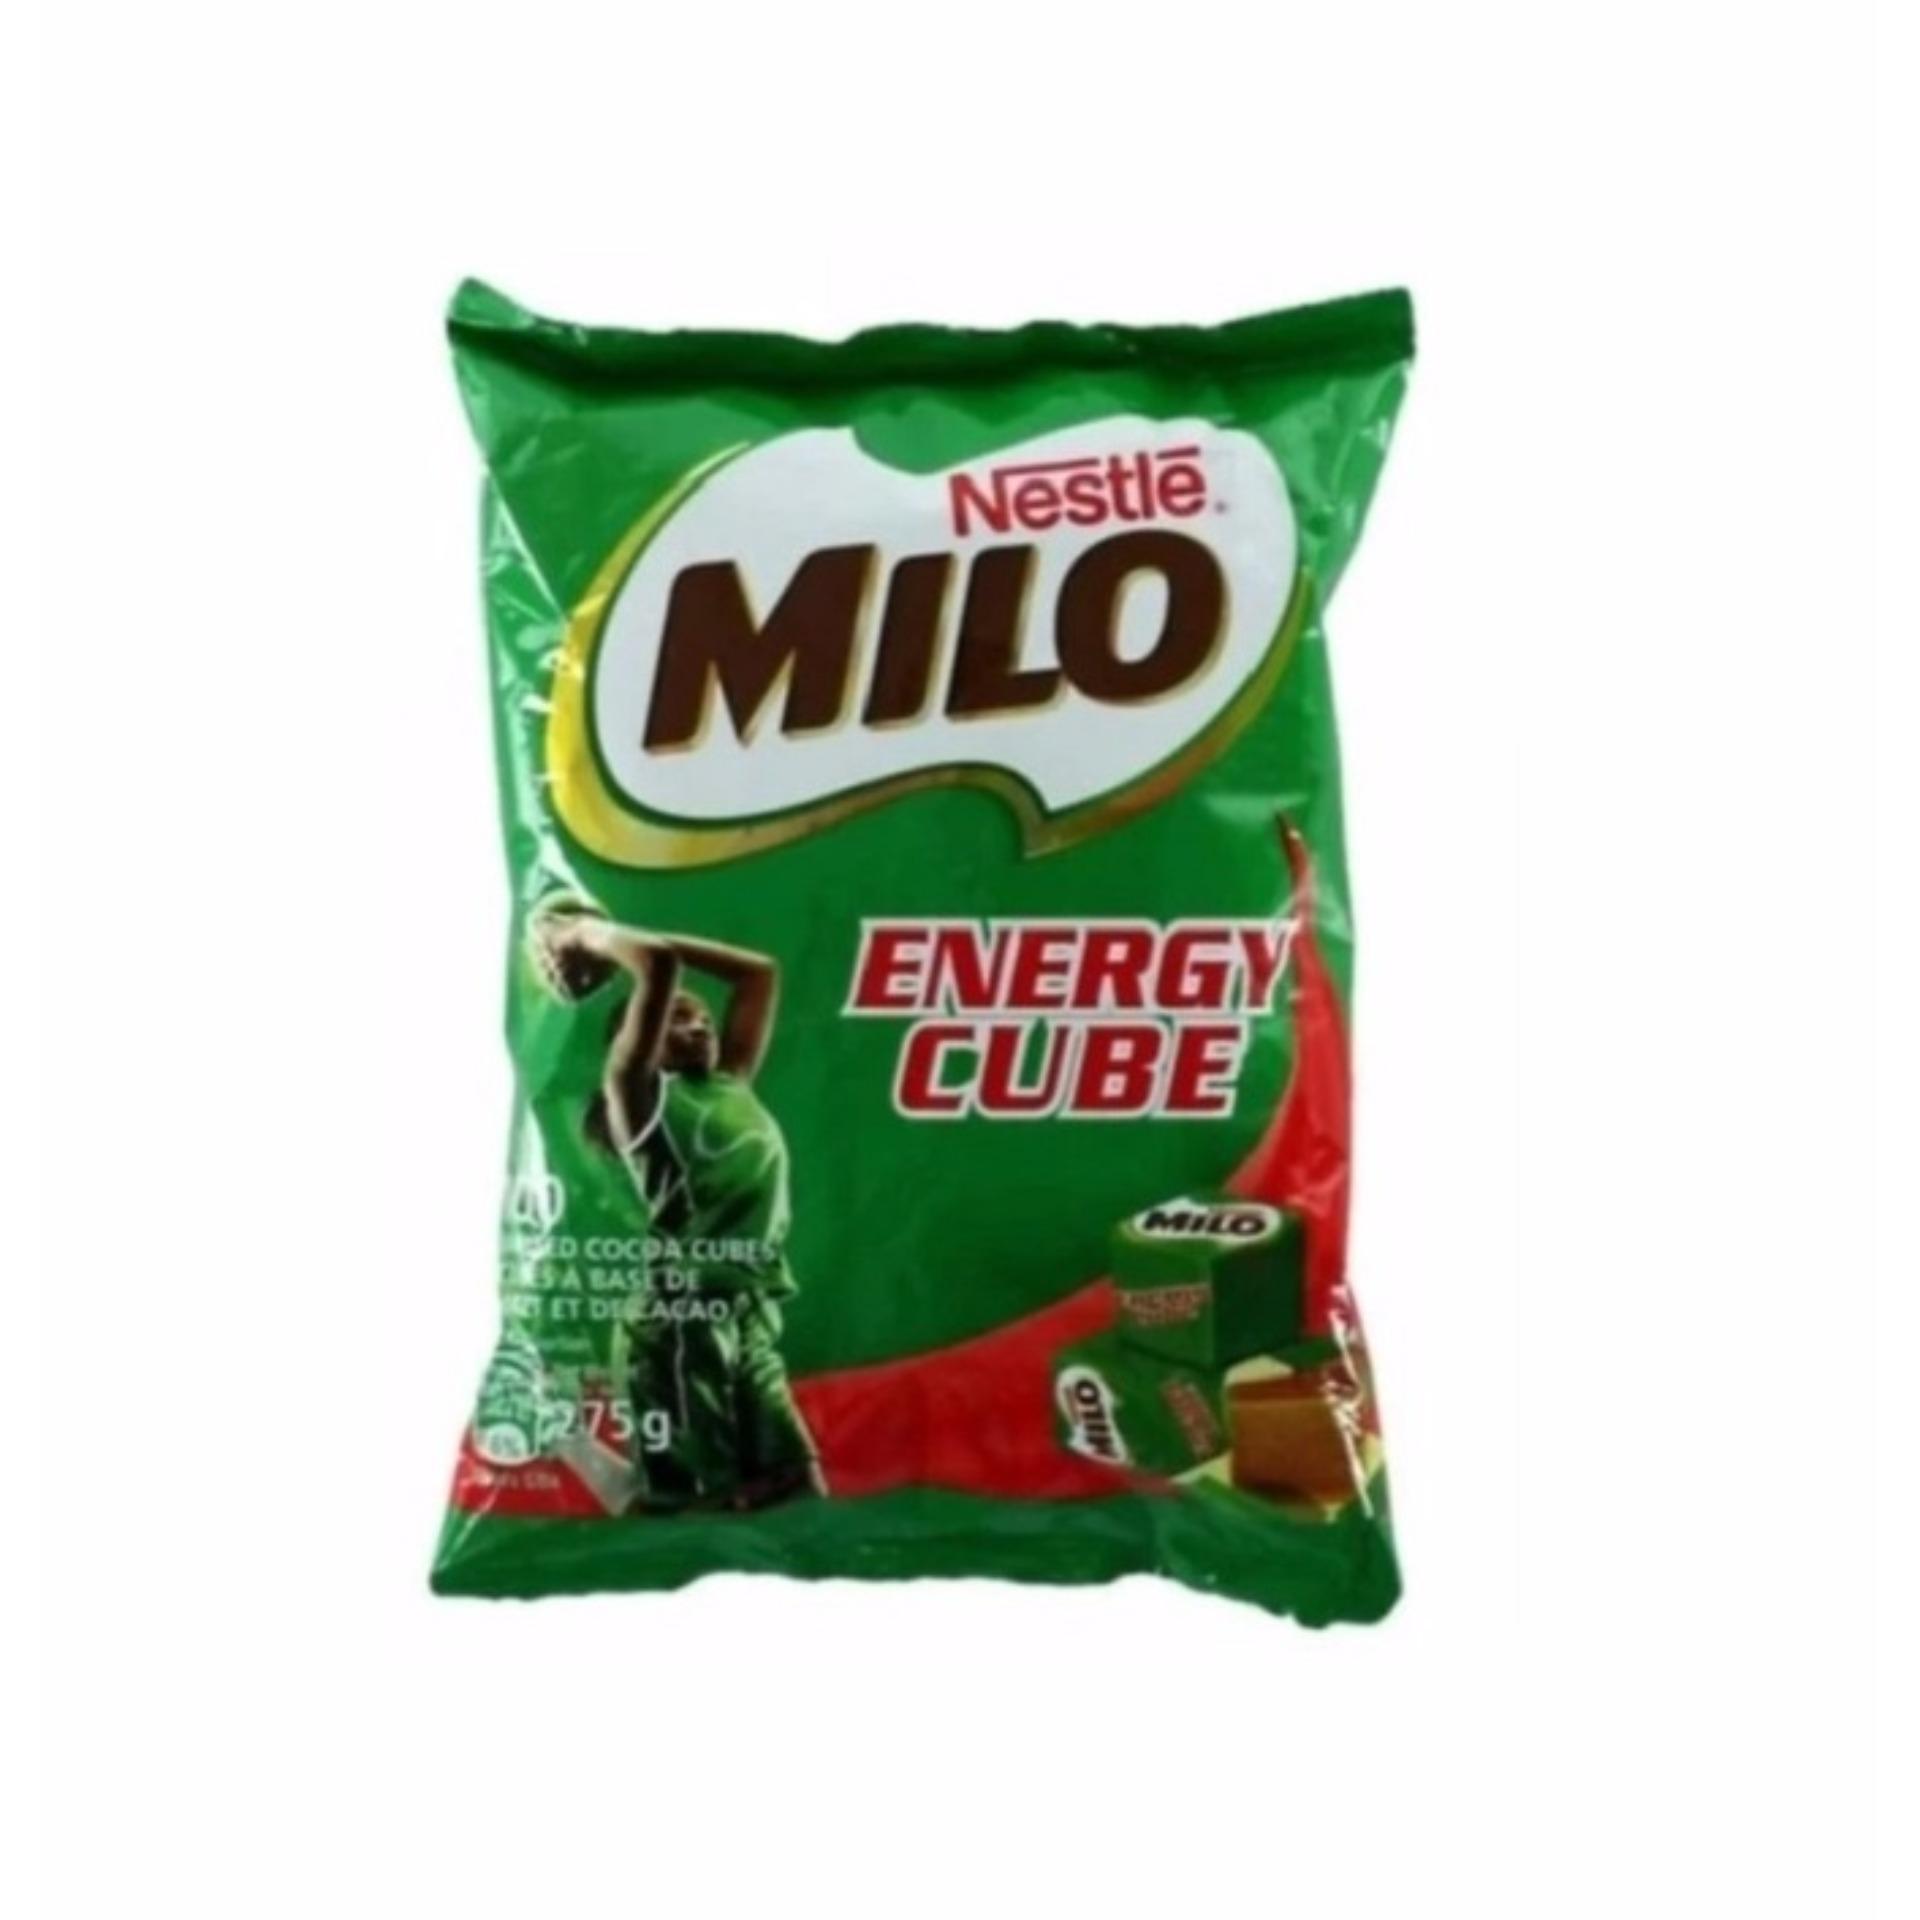 Katalog Nestle Milo Energy Cube 275 Gram 100 Biji Cube 1 Bungkus Terbaru